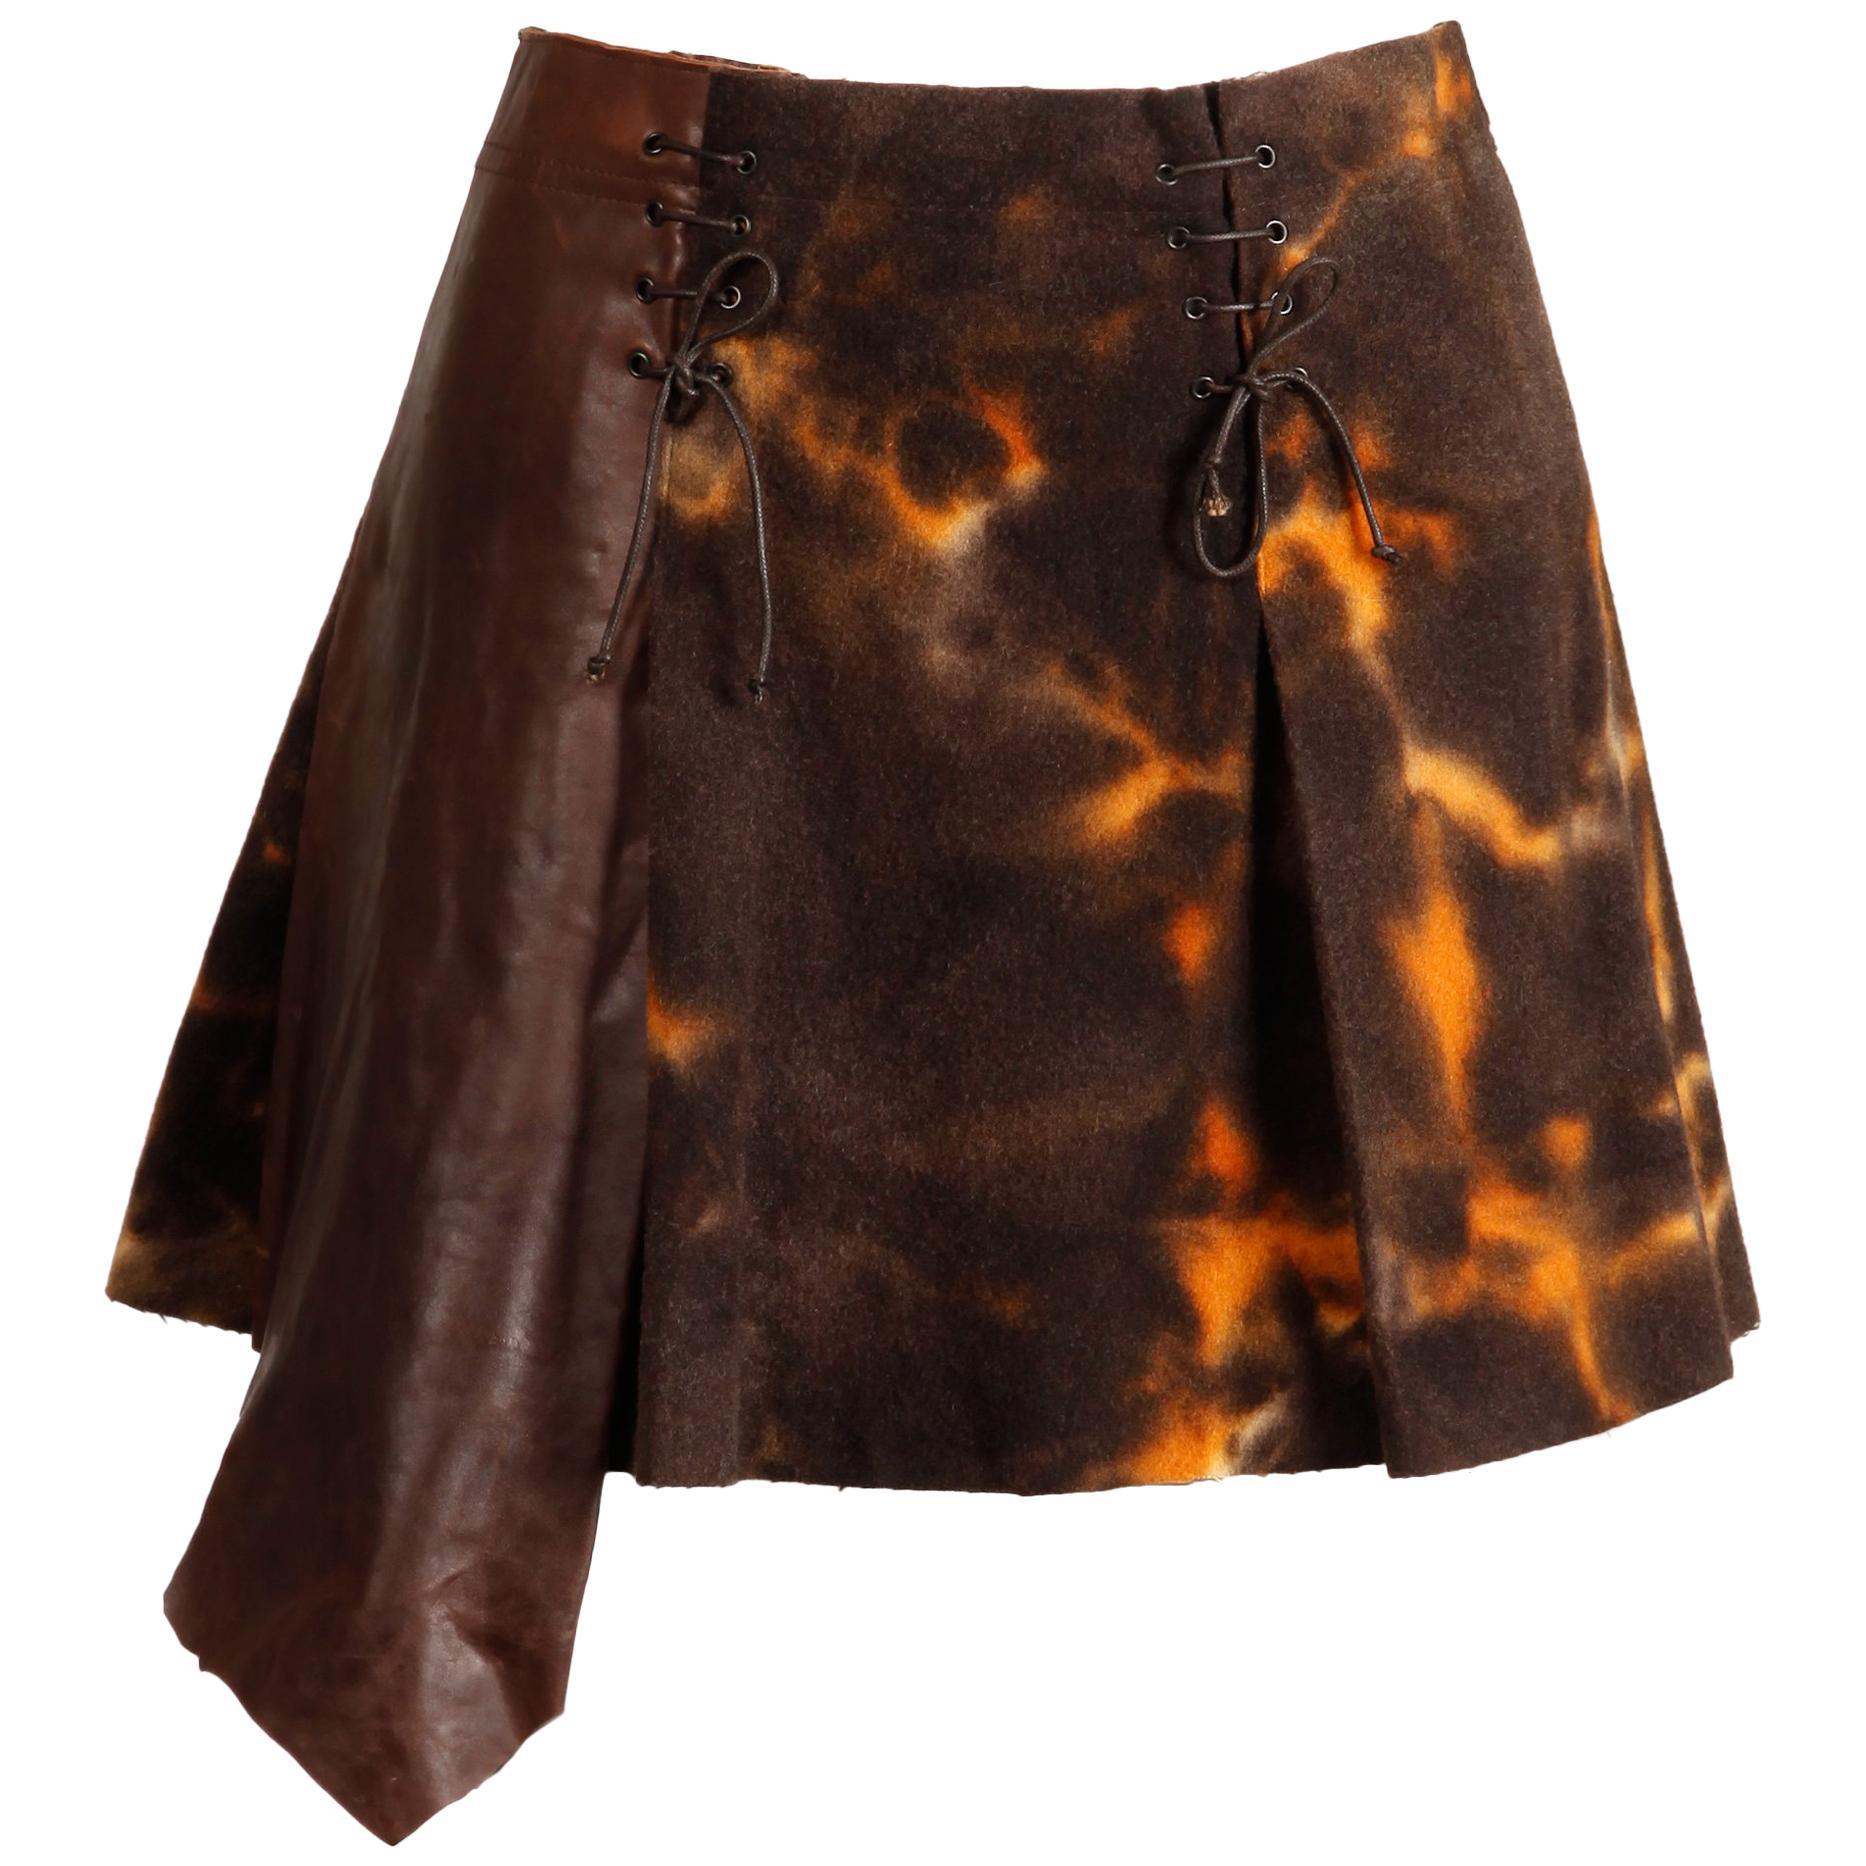 2000s Plein Sud Jeans Asymmetric Leather  Tie Dye Felted Wool Lace Up Mini Skirt